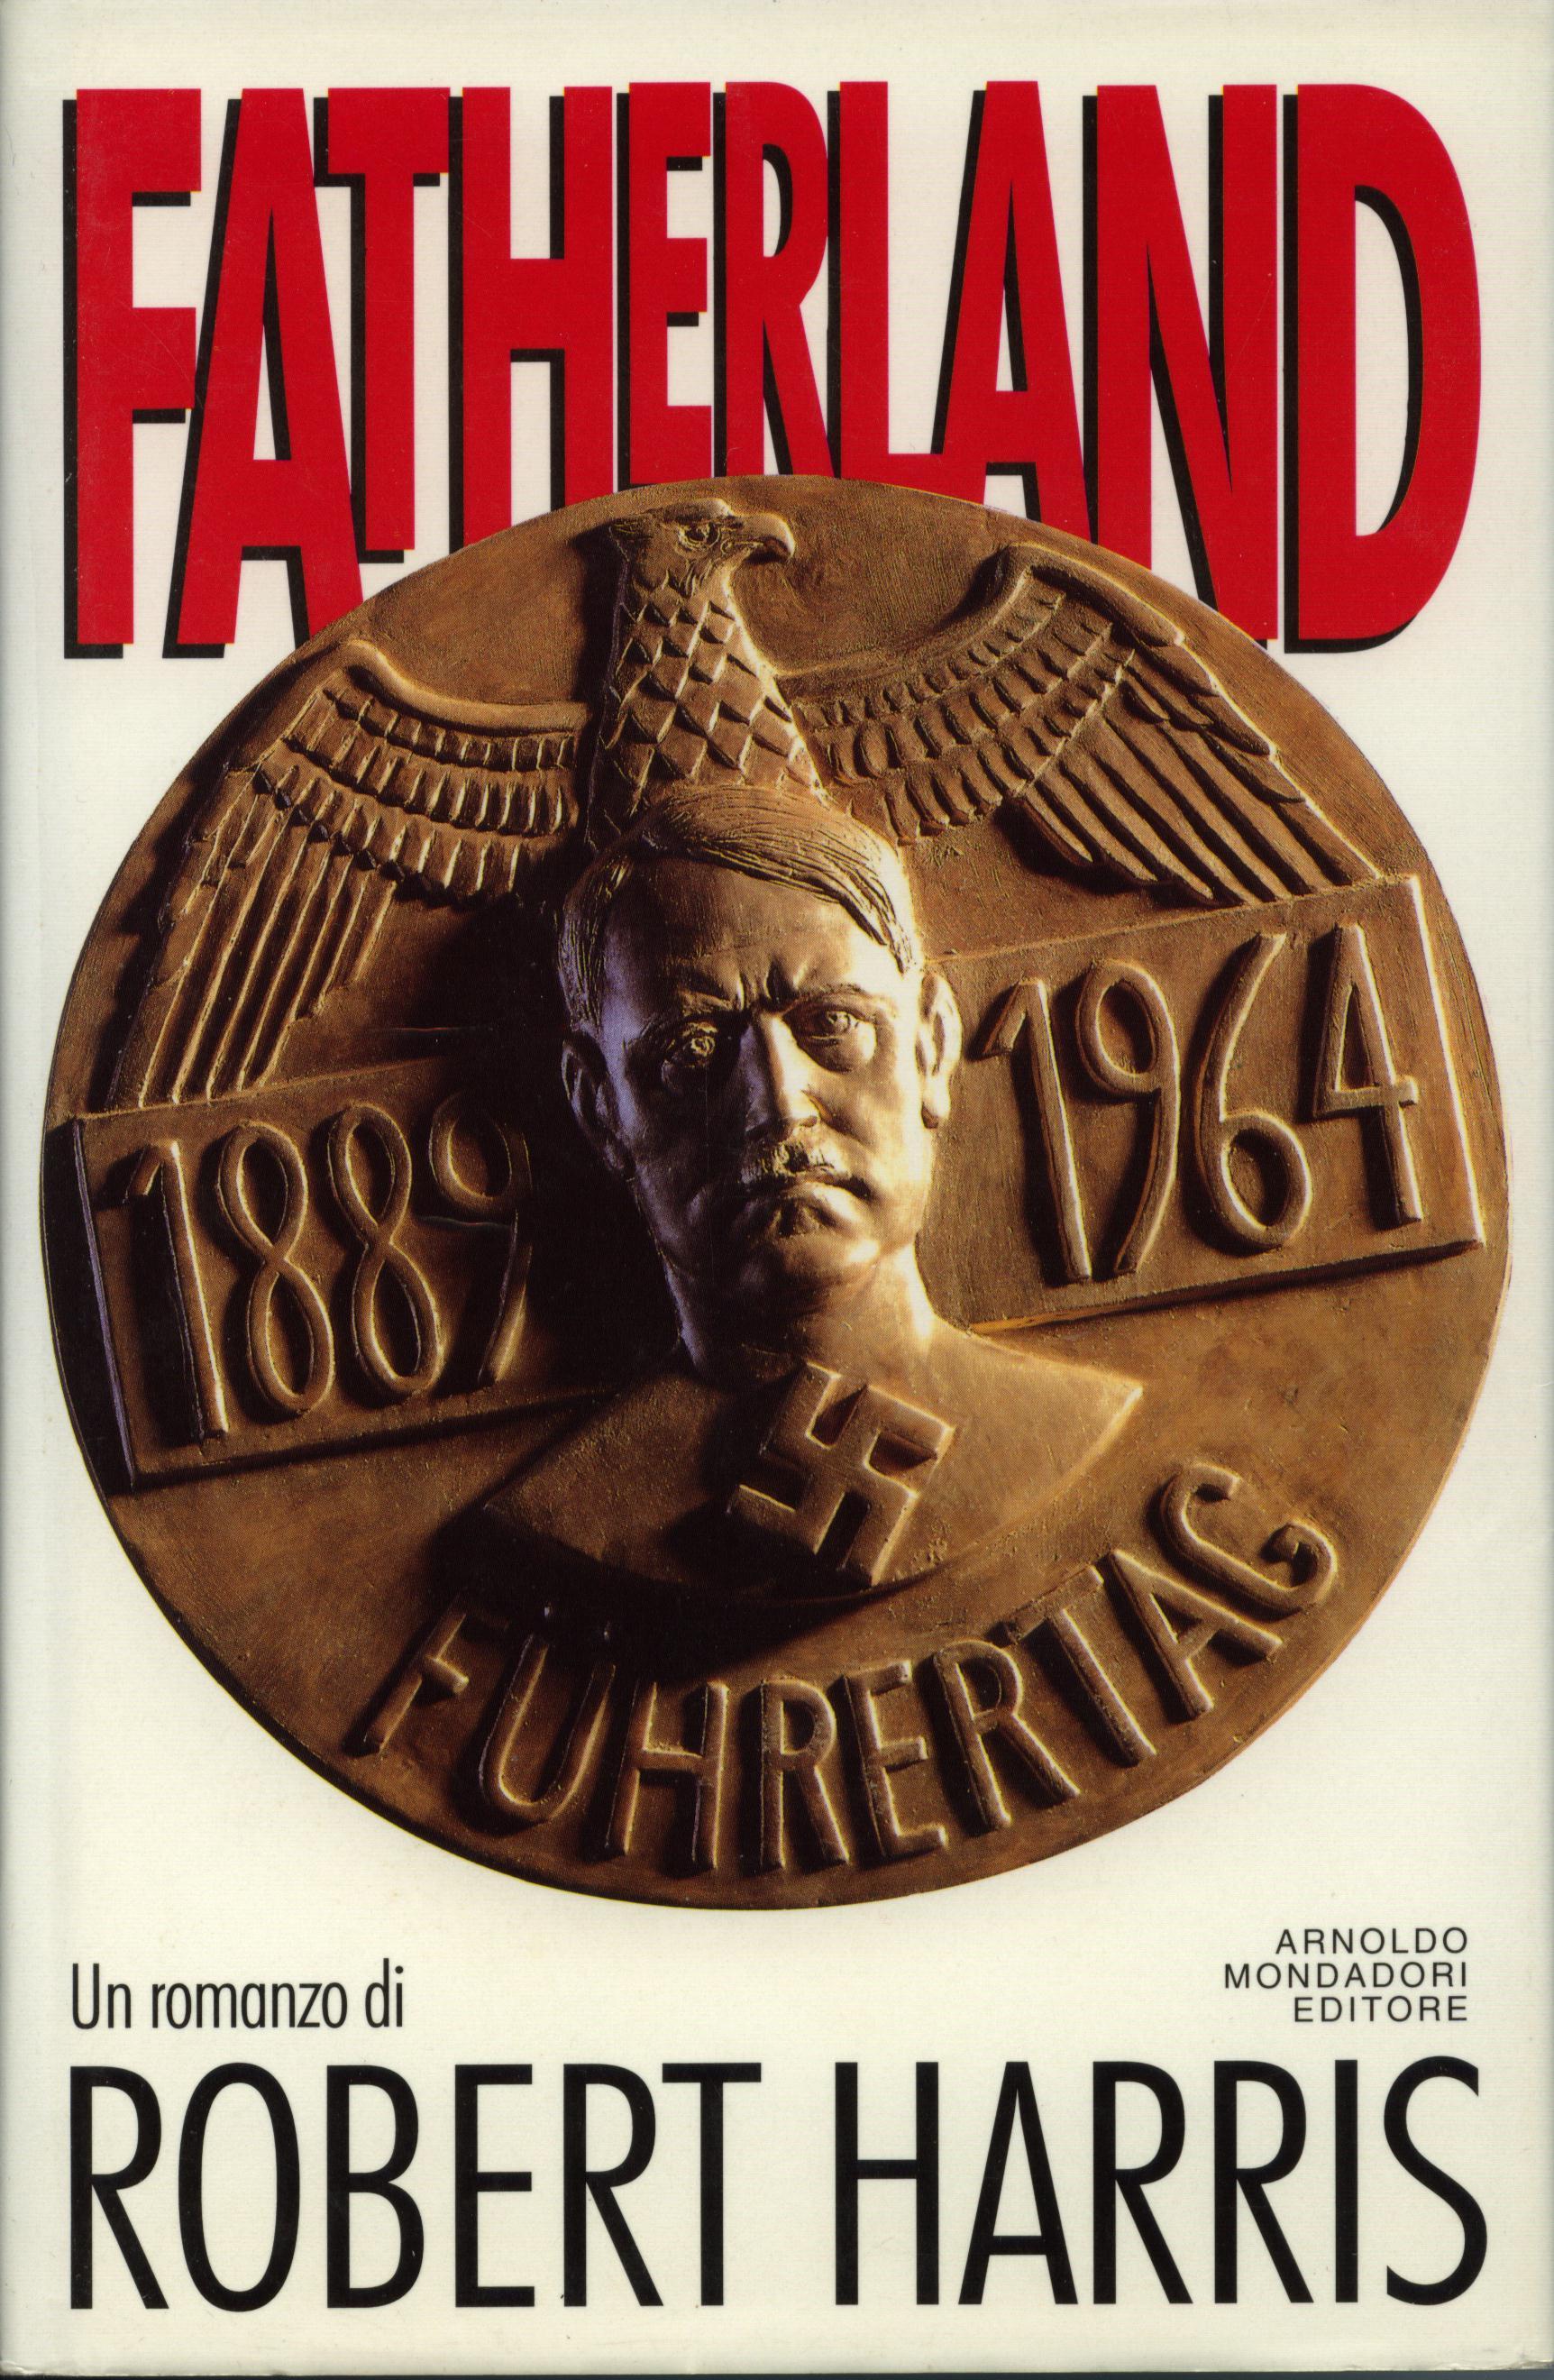 !!! SCHEDA INCOMPLETA - Fatherland